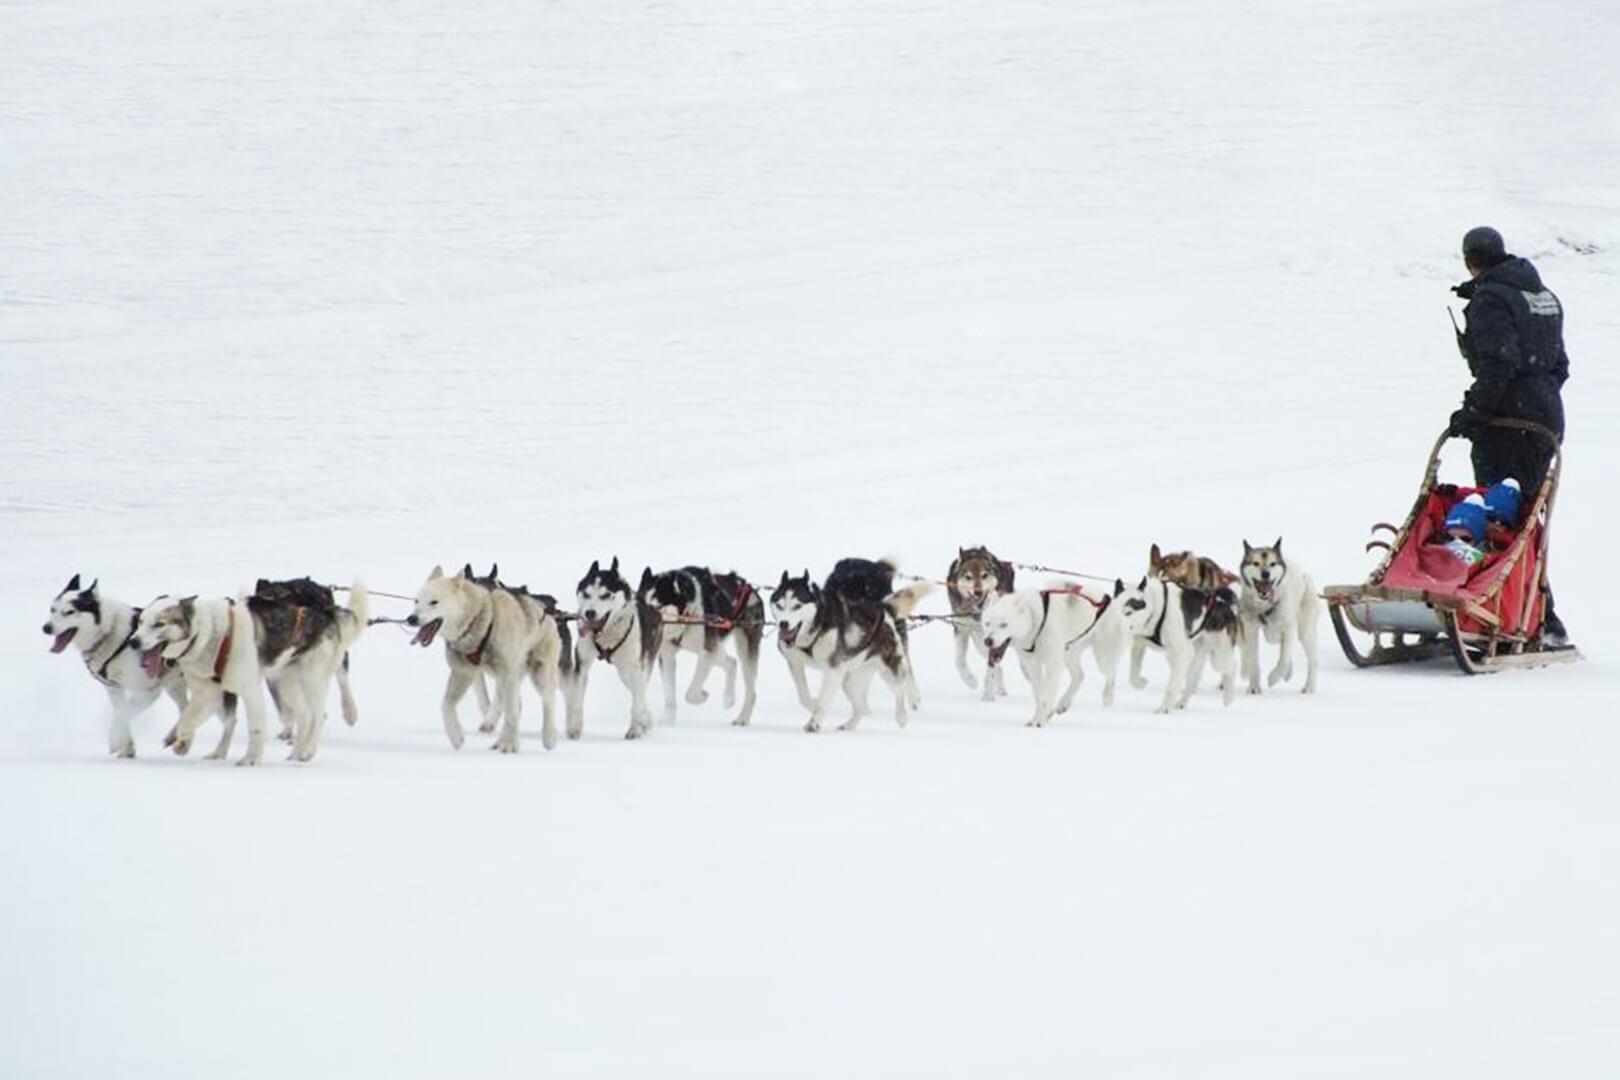 bambini sulle slitte trainate dai cani in Valetllina